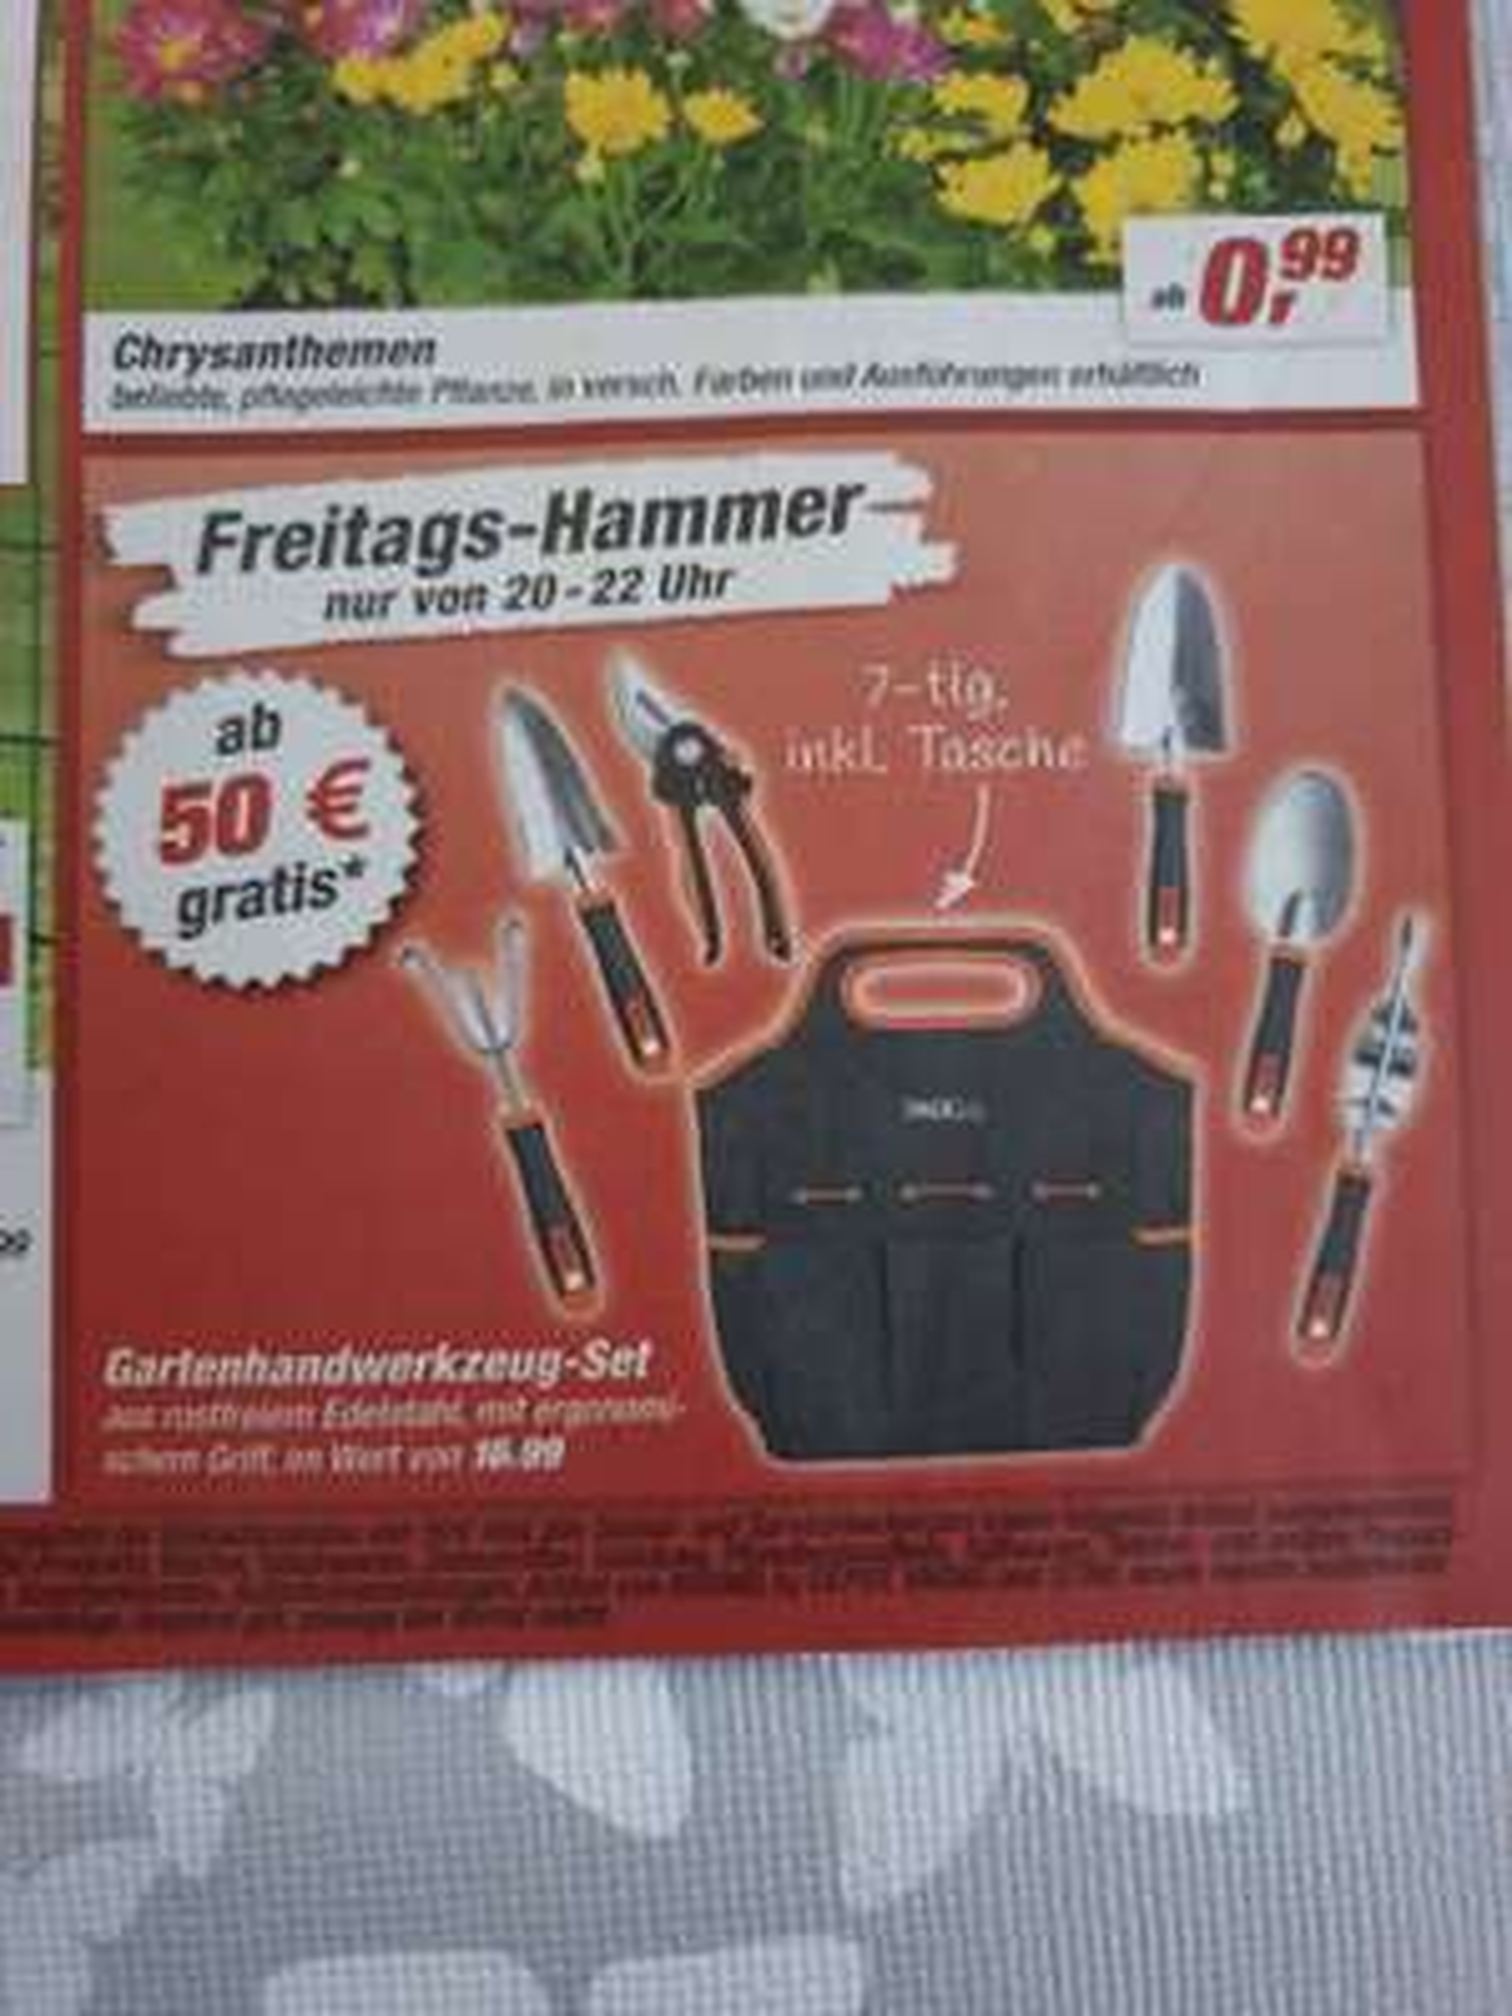 Ab 50€, Gartenhandwerkzeug-Set gratis bei toom